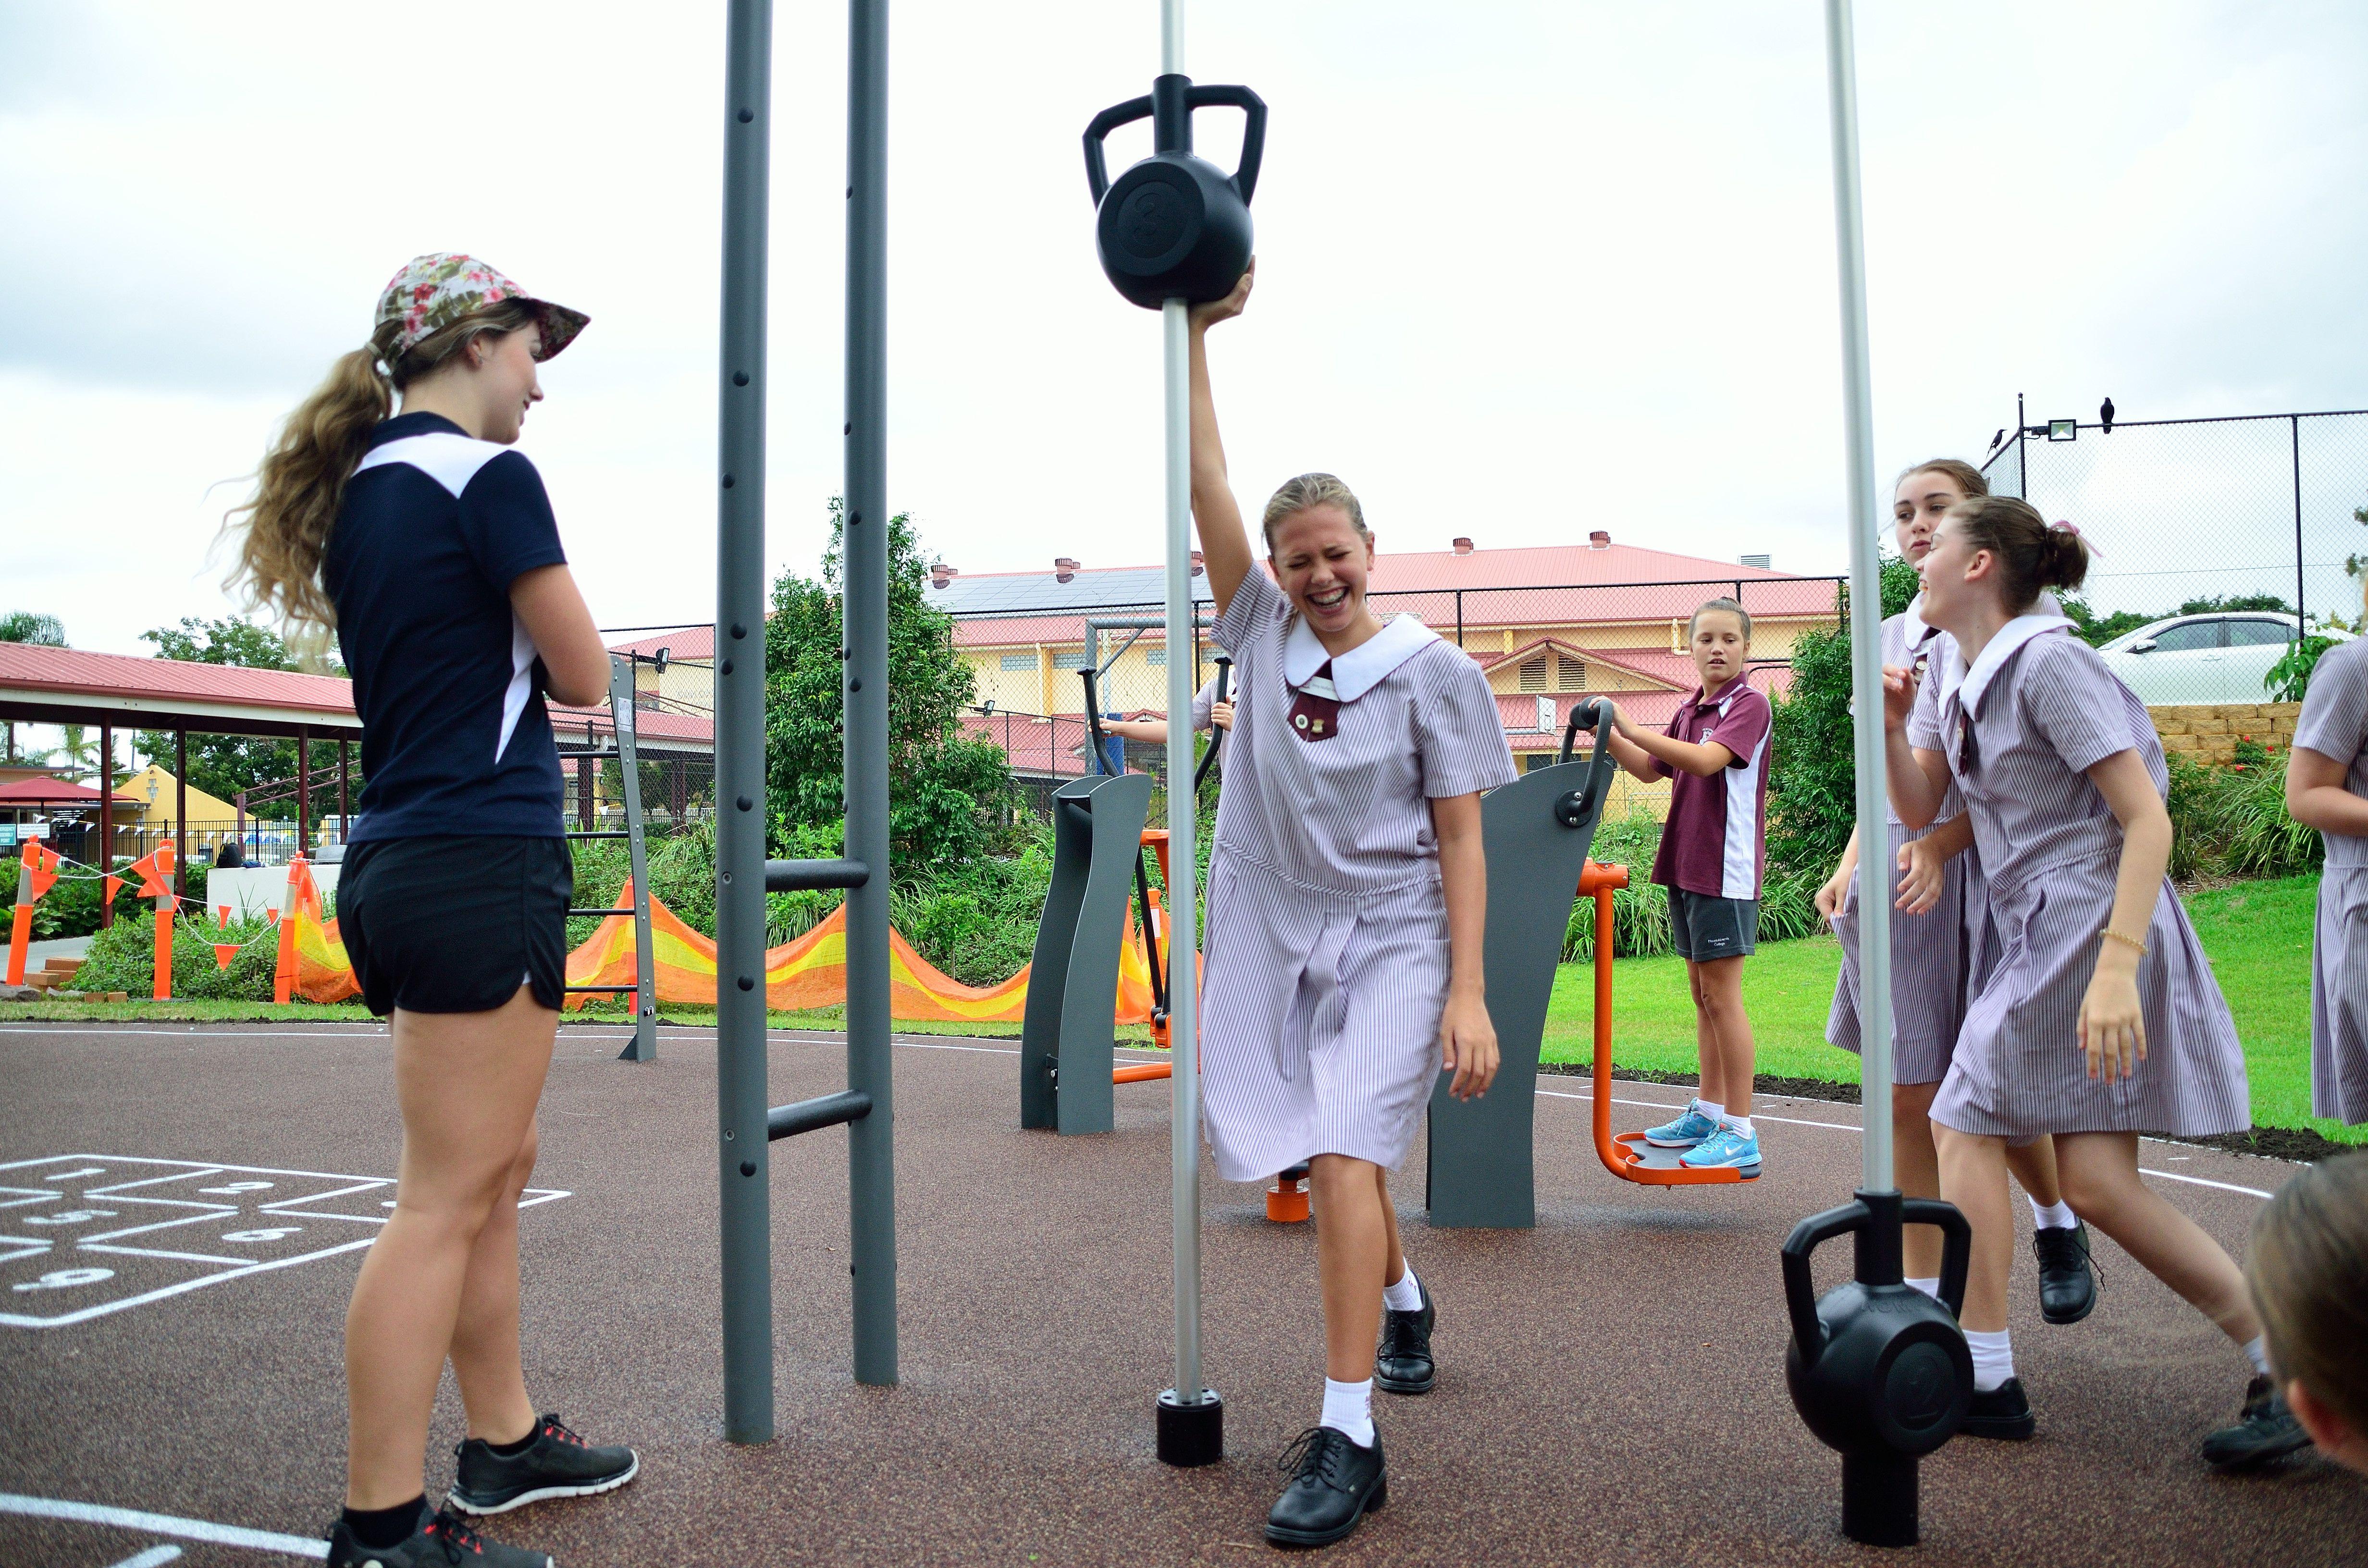 Urban Play Outdoor Fitness Equipment No Equipment Workout Outdoor Fitness Equipment Outdoor Workouts